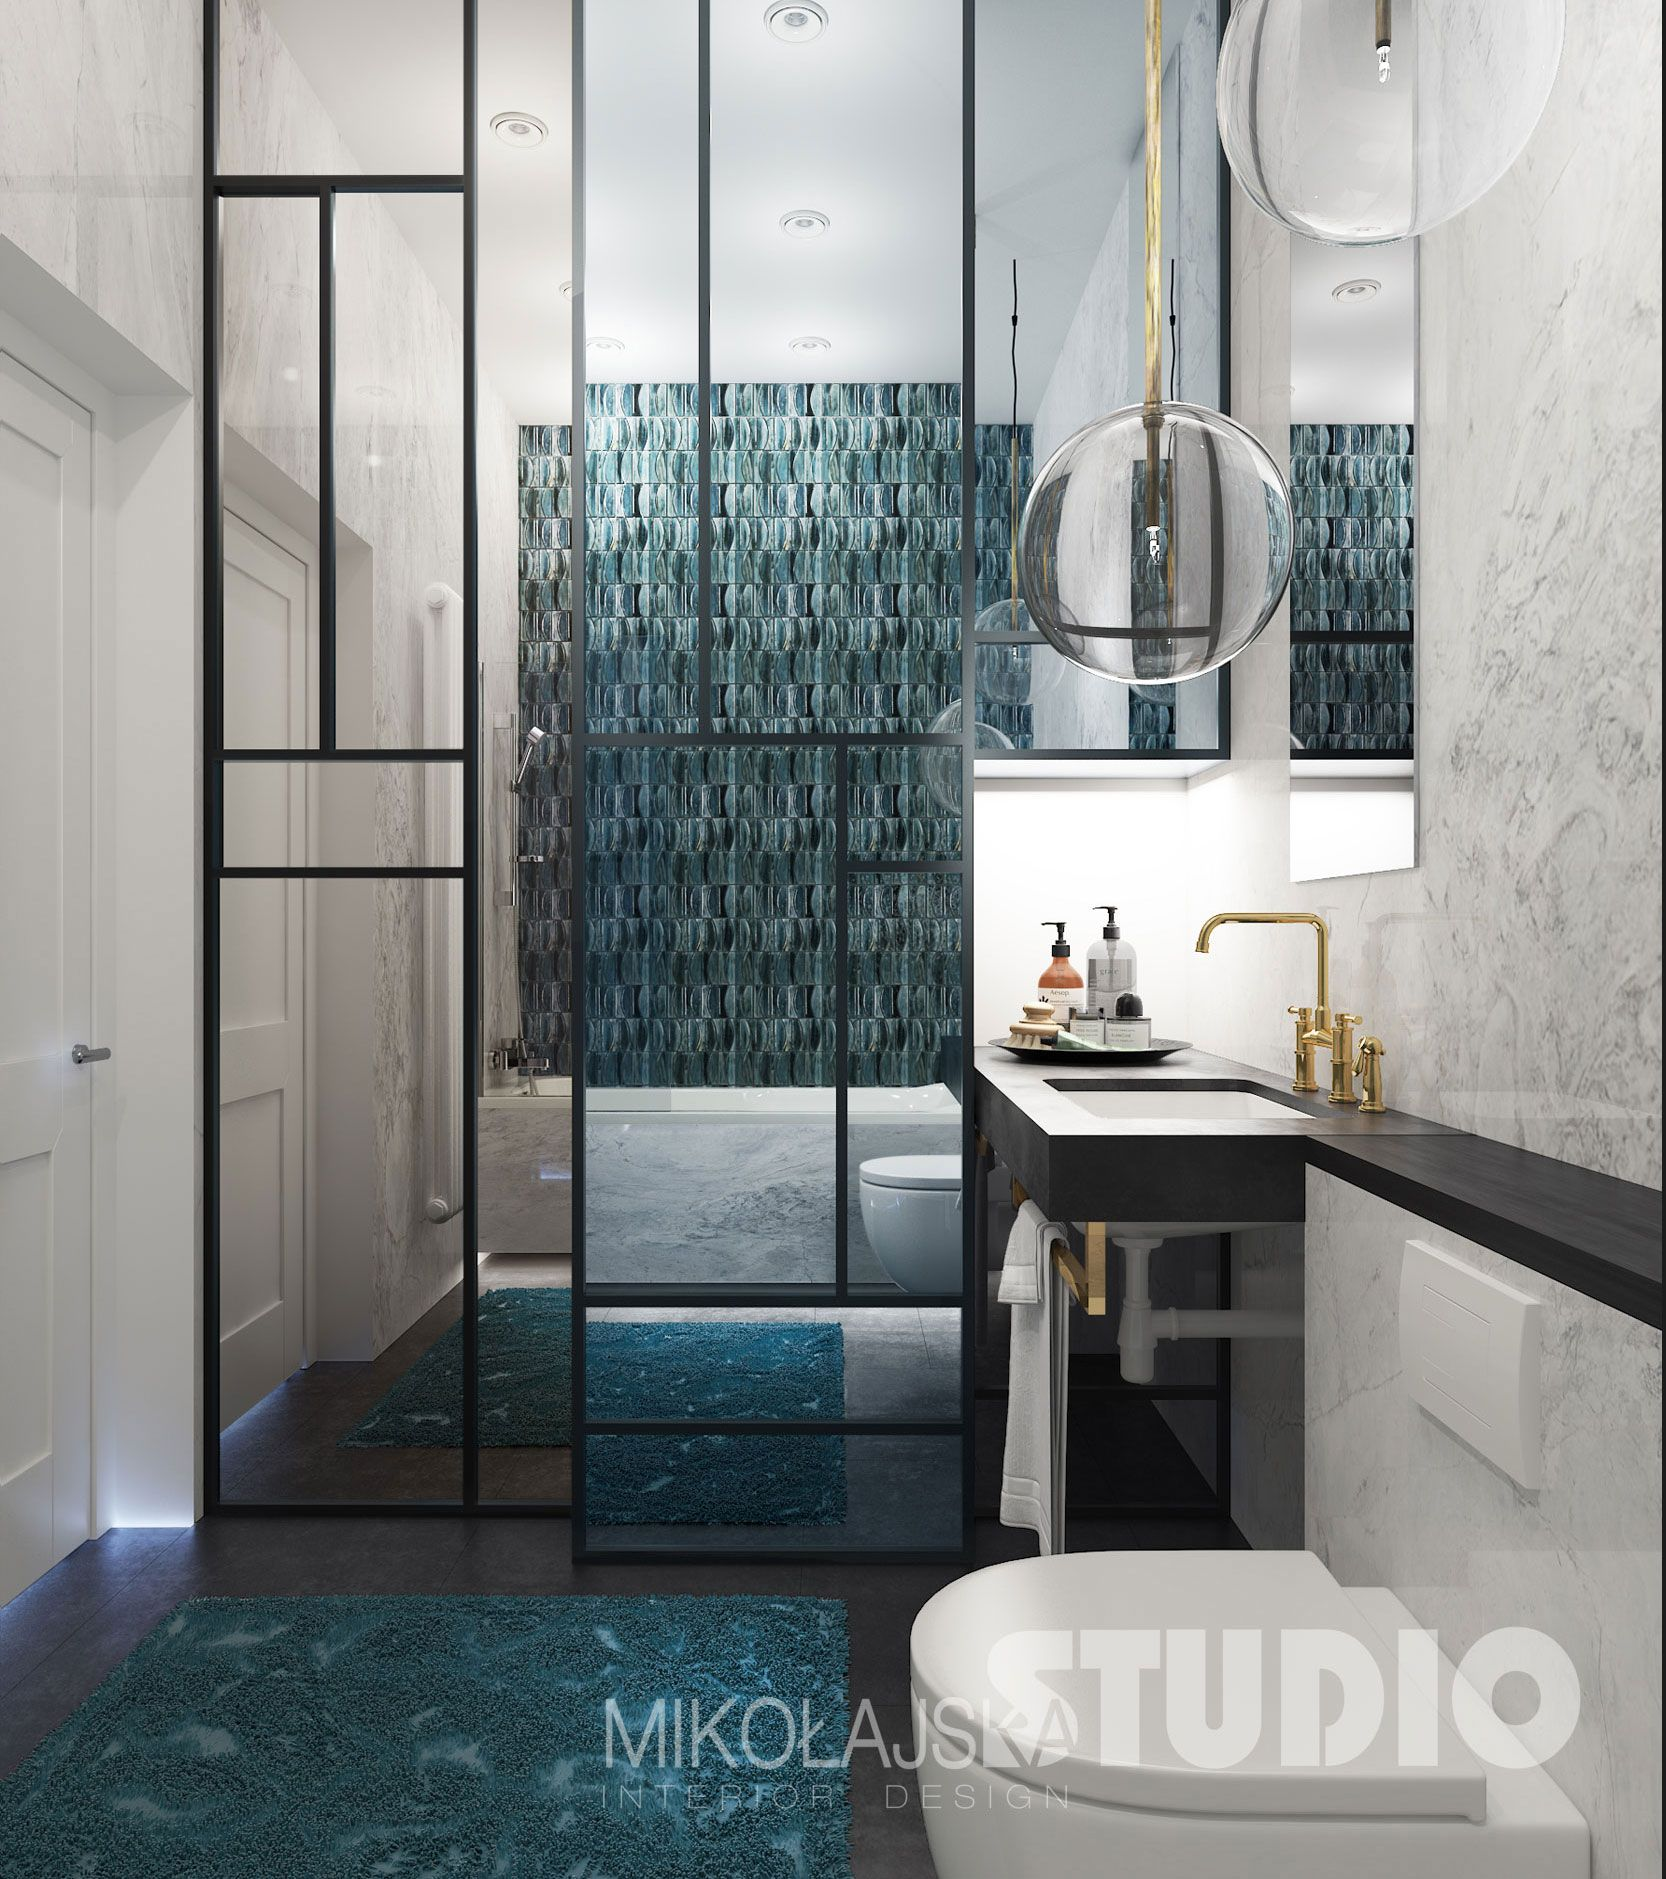 Turkus W Lazience Tropical Modernism Bathroom Art Deco Bathroom